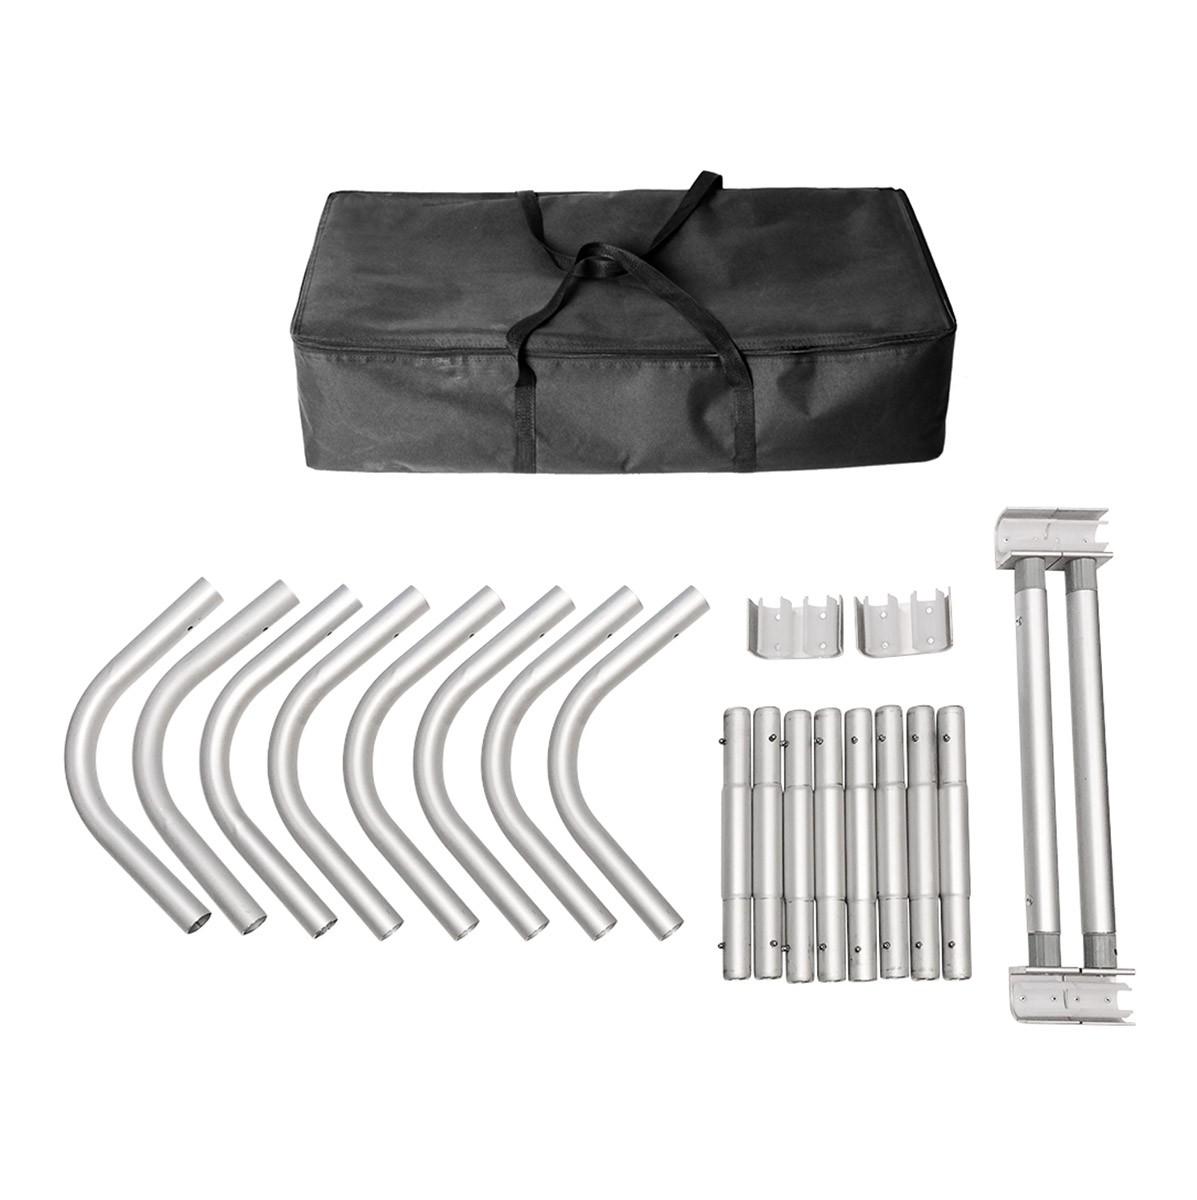 Aluminum Tube Fabric A-Frame 2x2